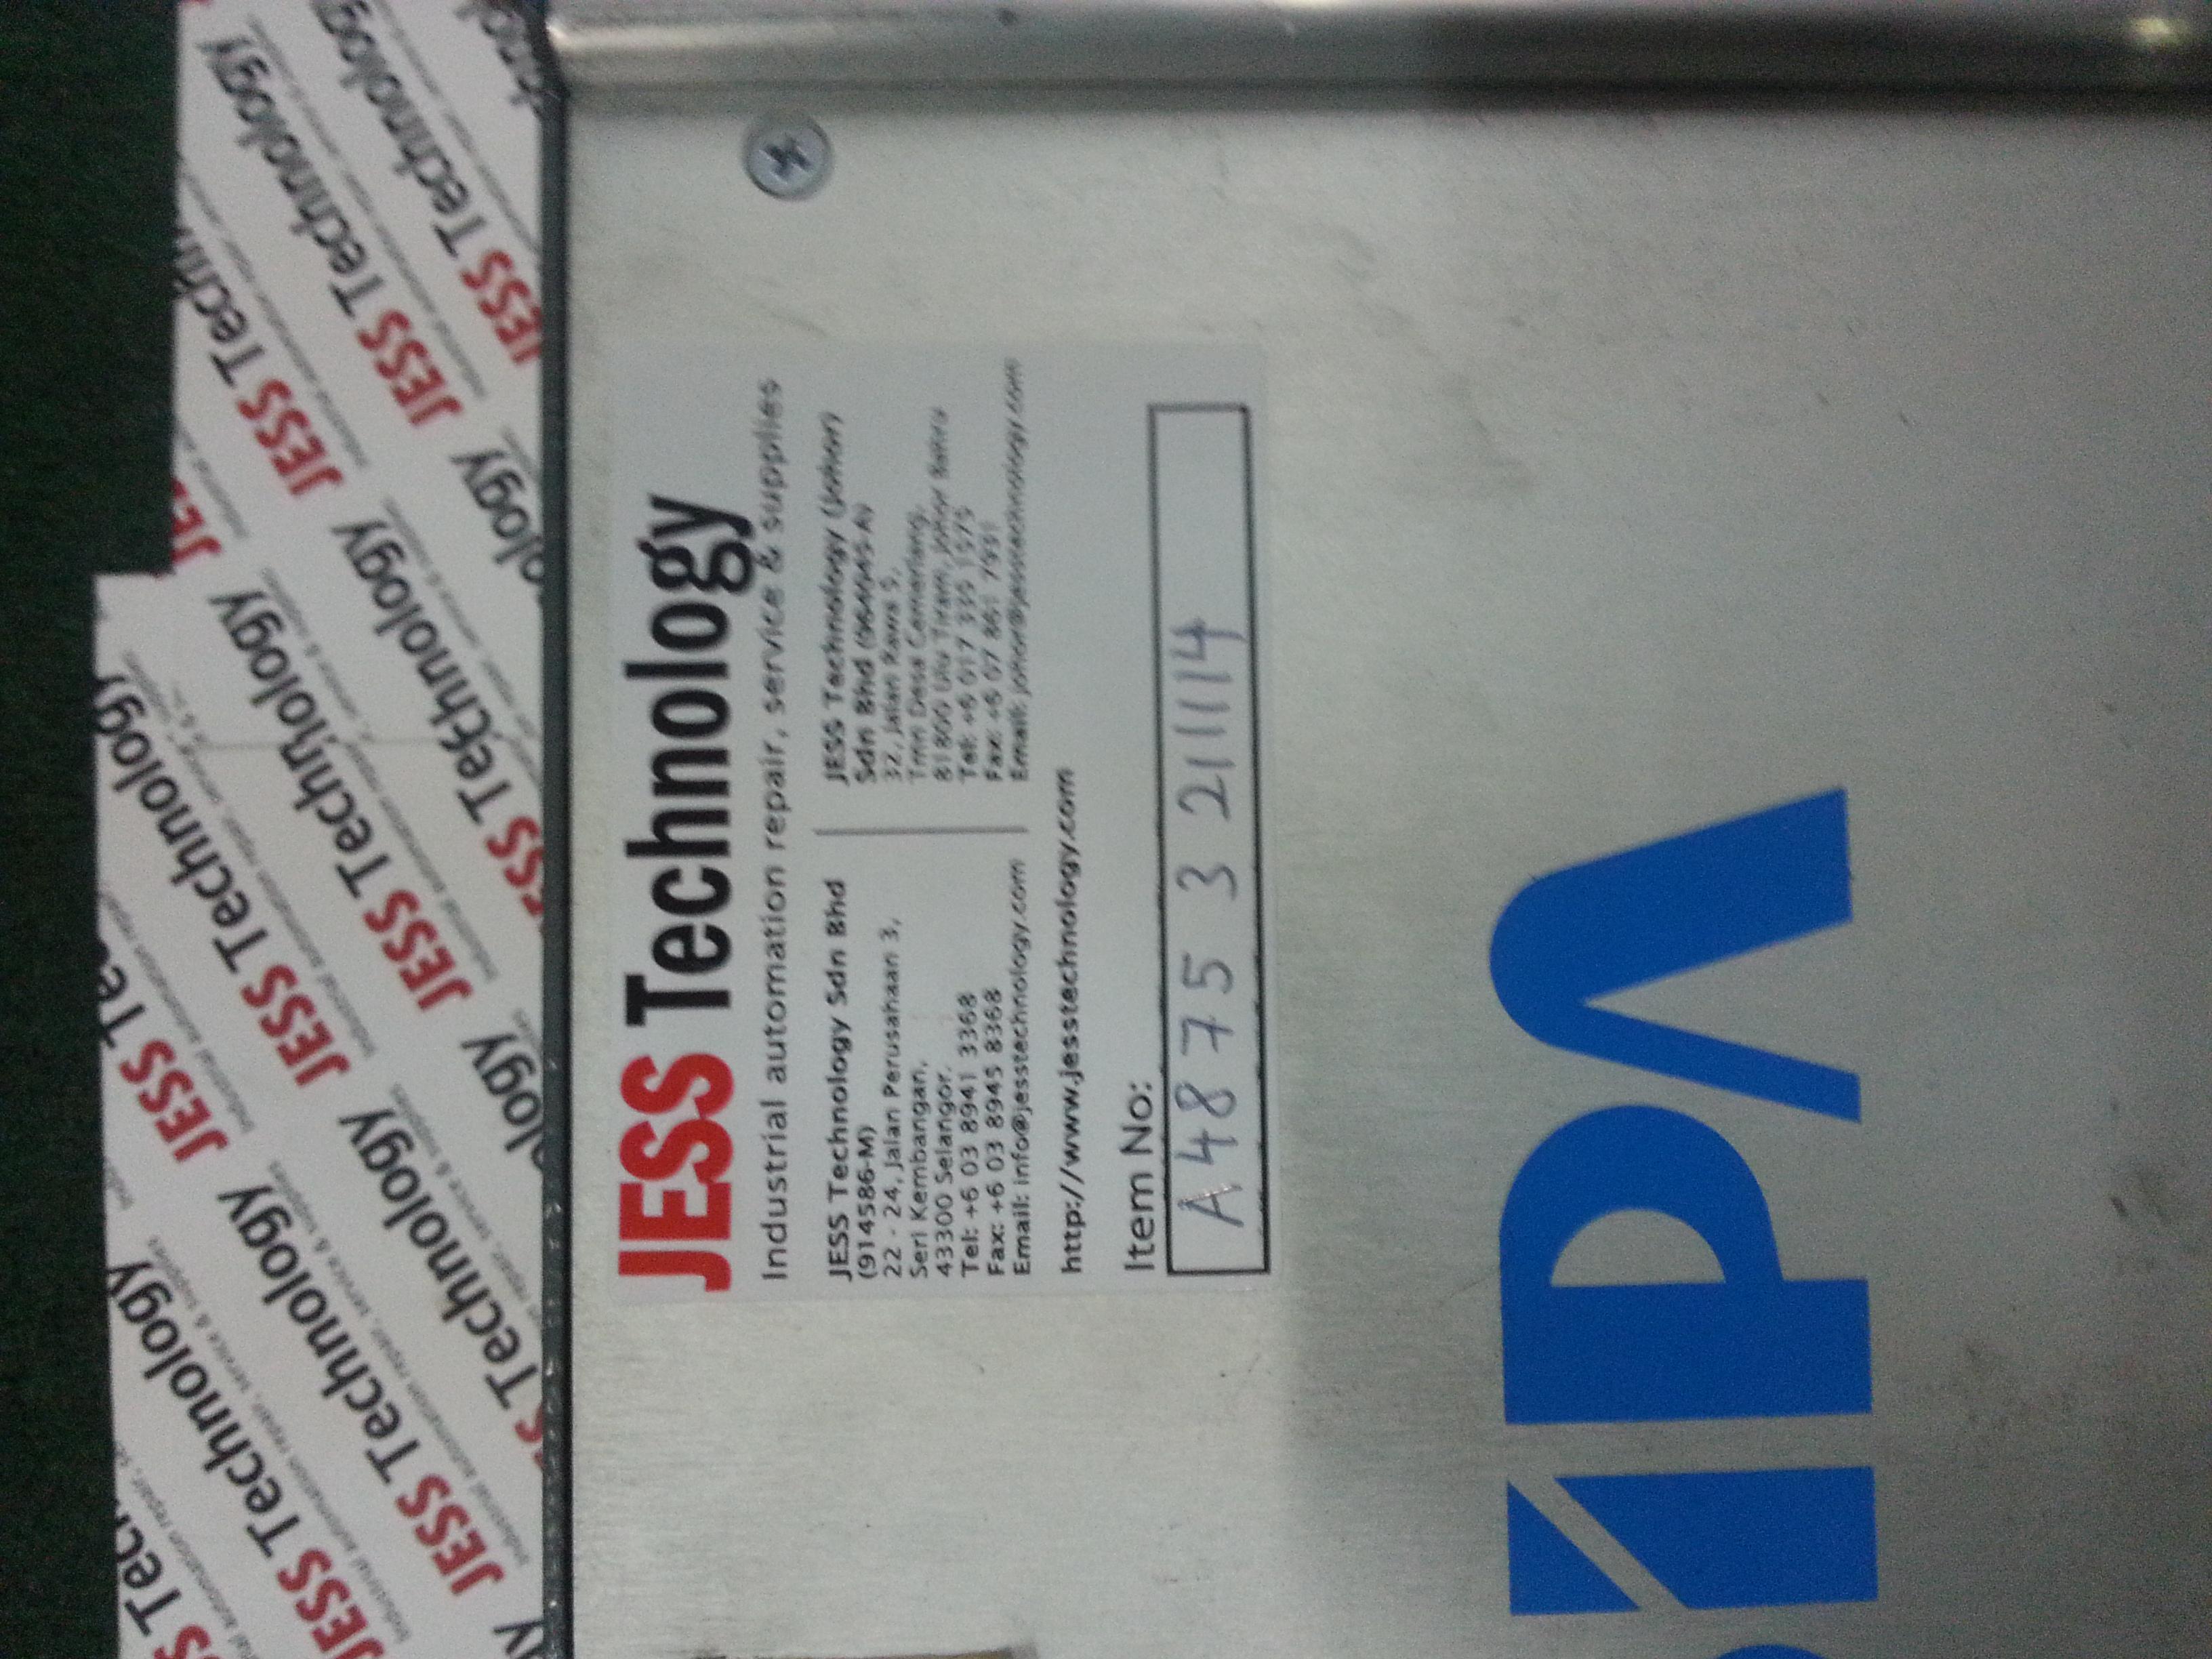 Repair SP/IRAZ24 SIPA SIPA  in Malaysia, Singapore, Thailand, Indonesia